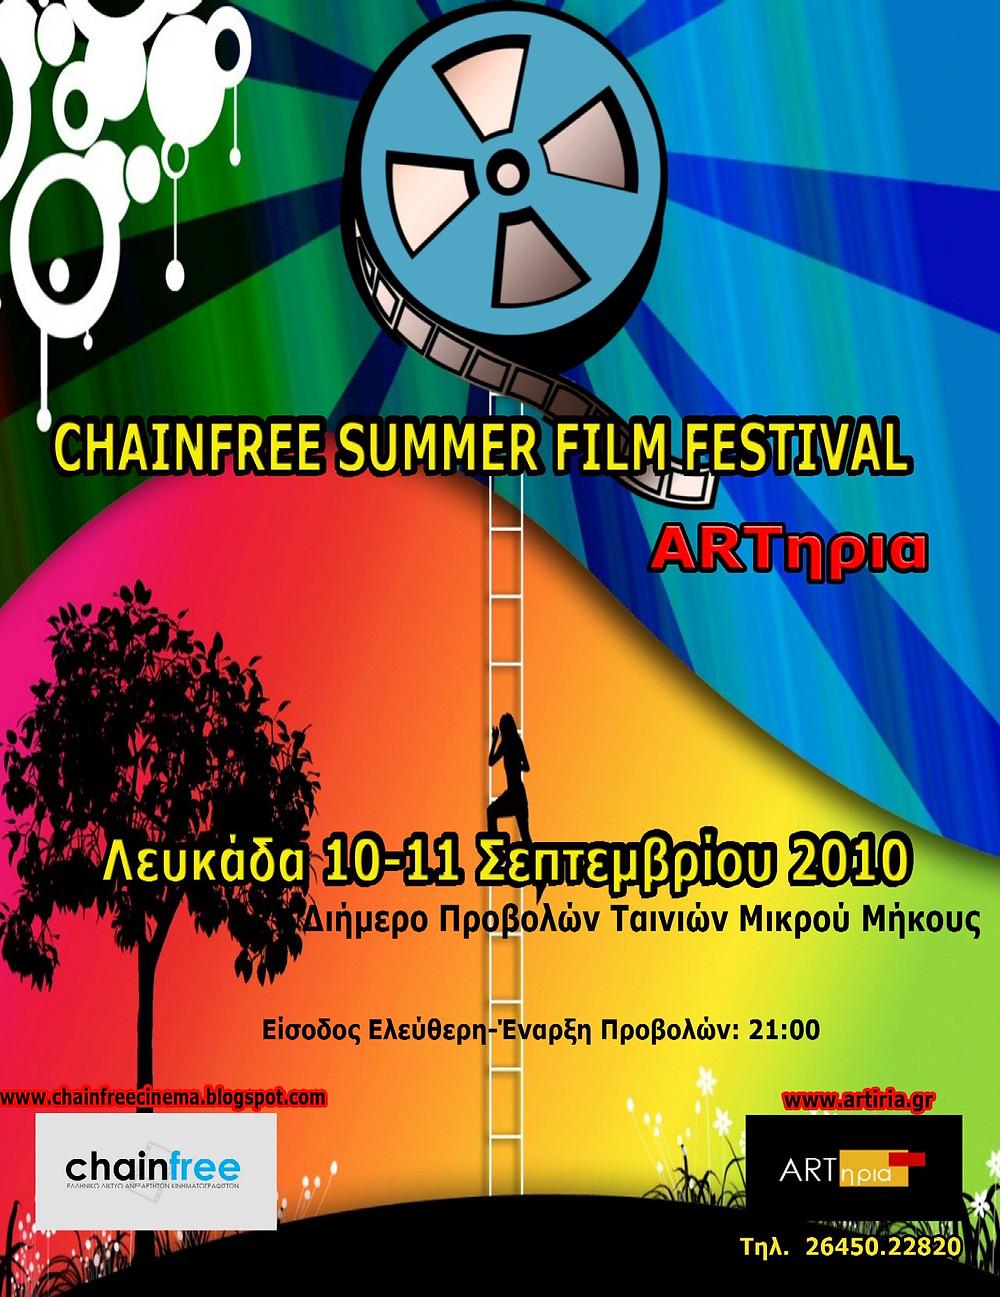 Chainfree_Artiria_2010_poster.jpg